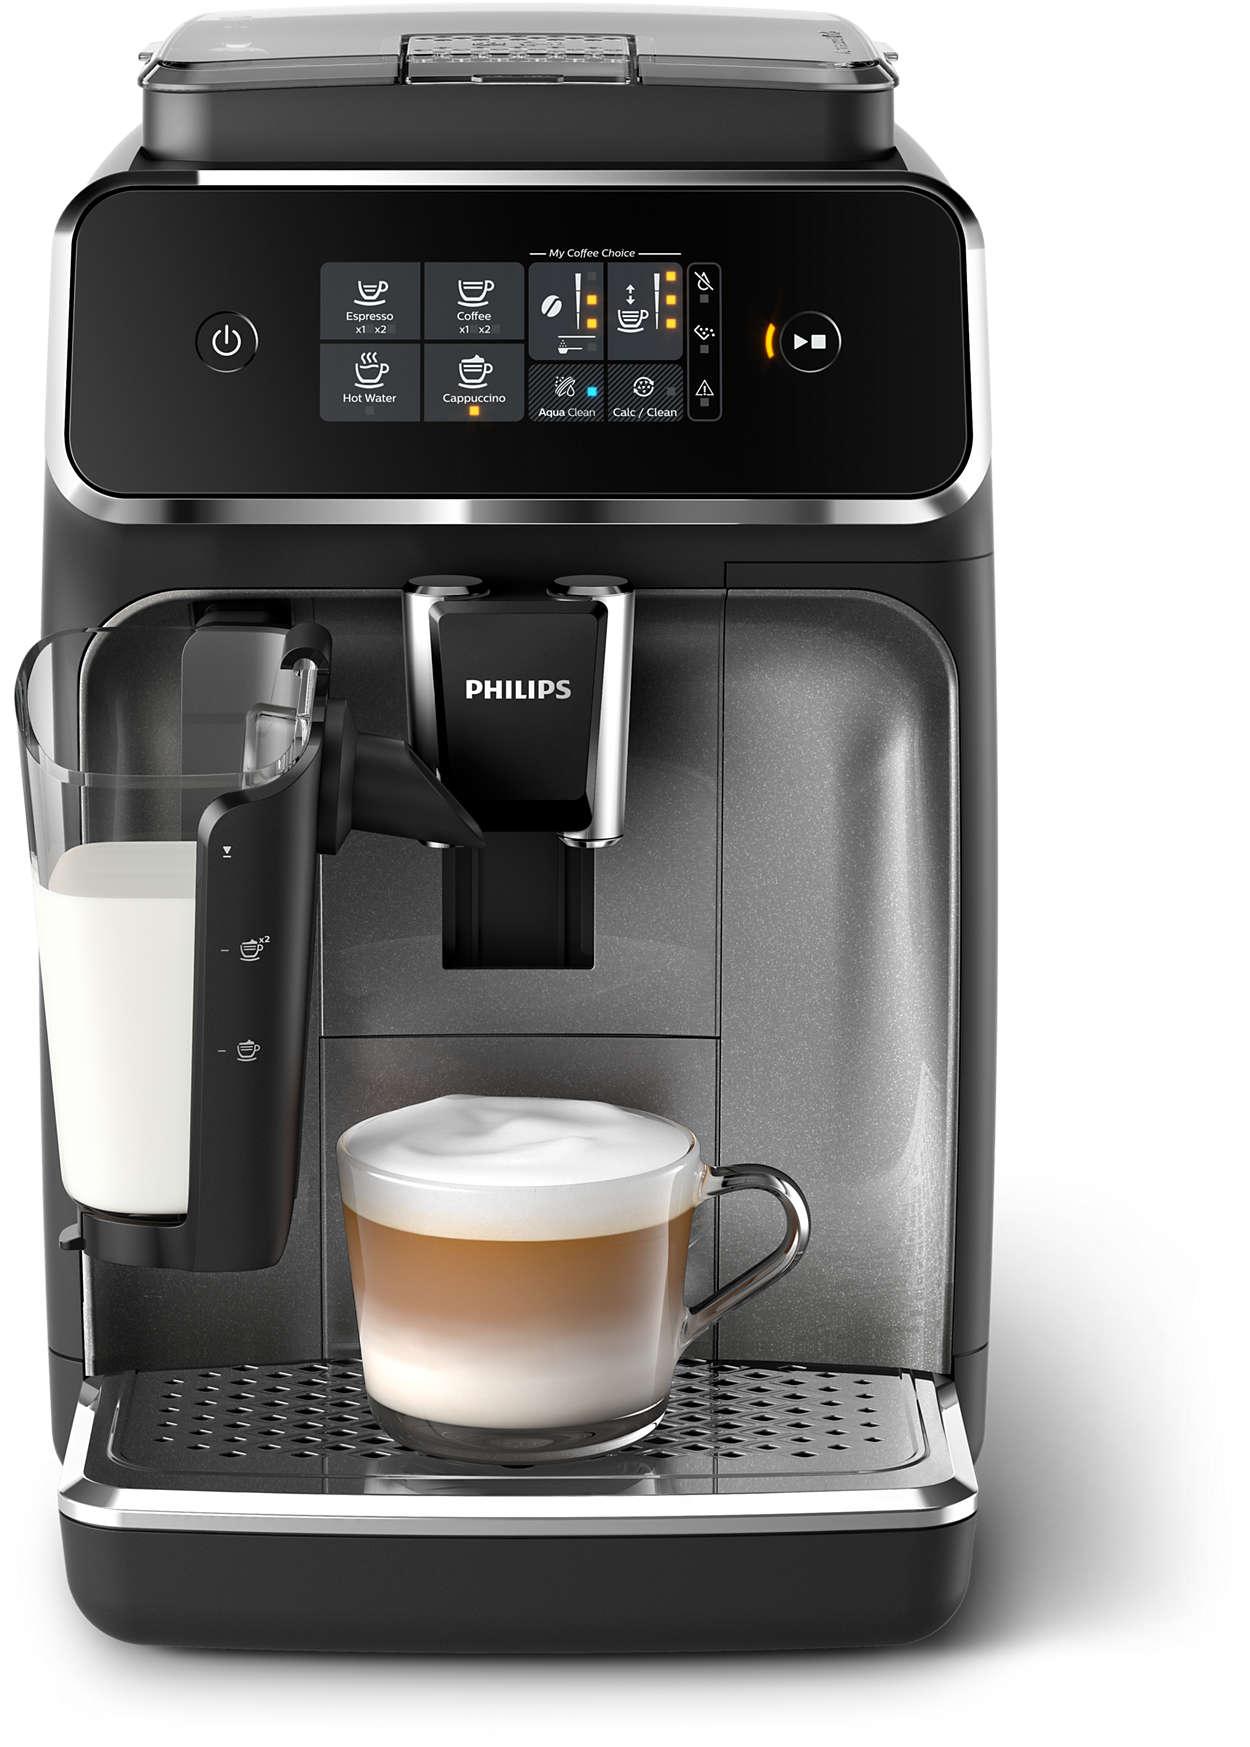 3 delicious fresh bean coffees, easier than ever